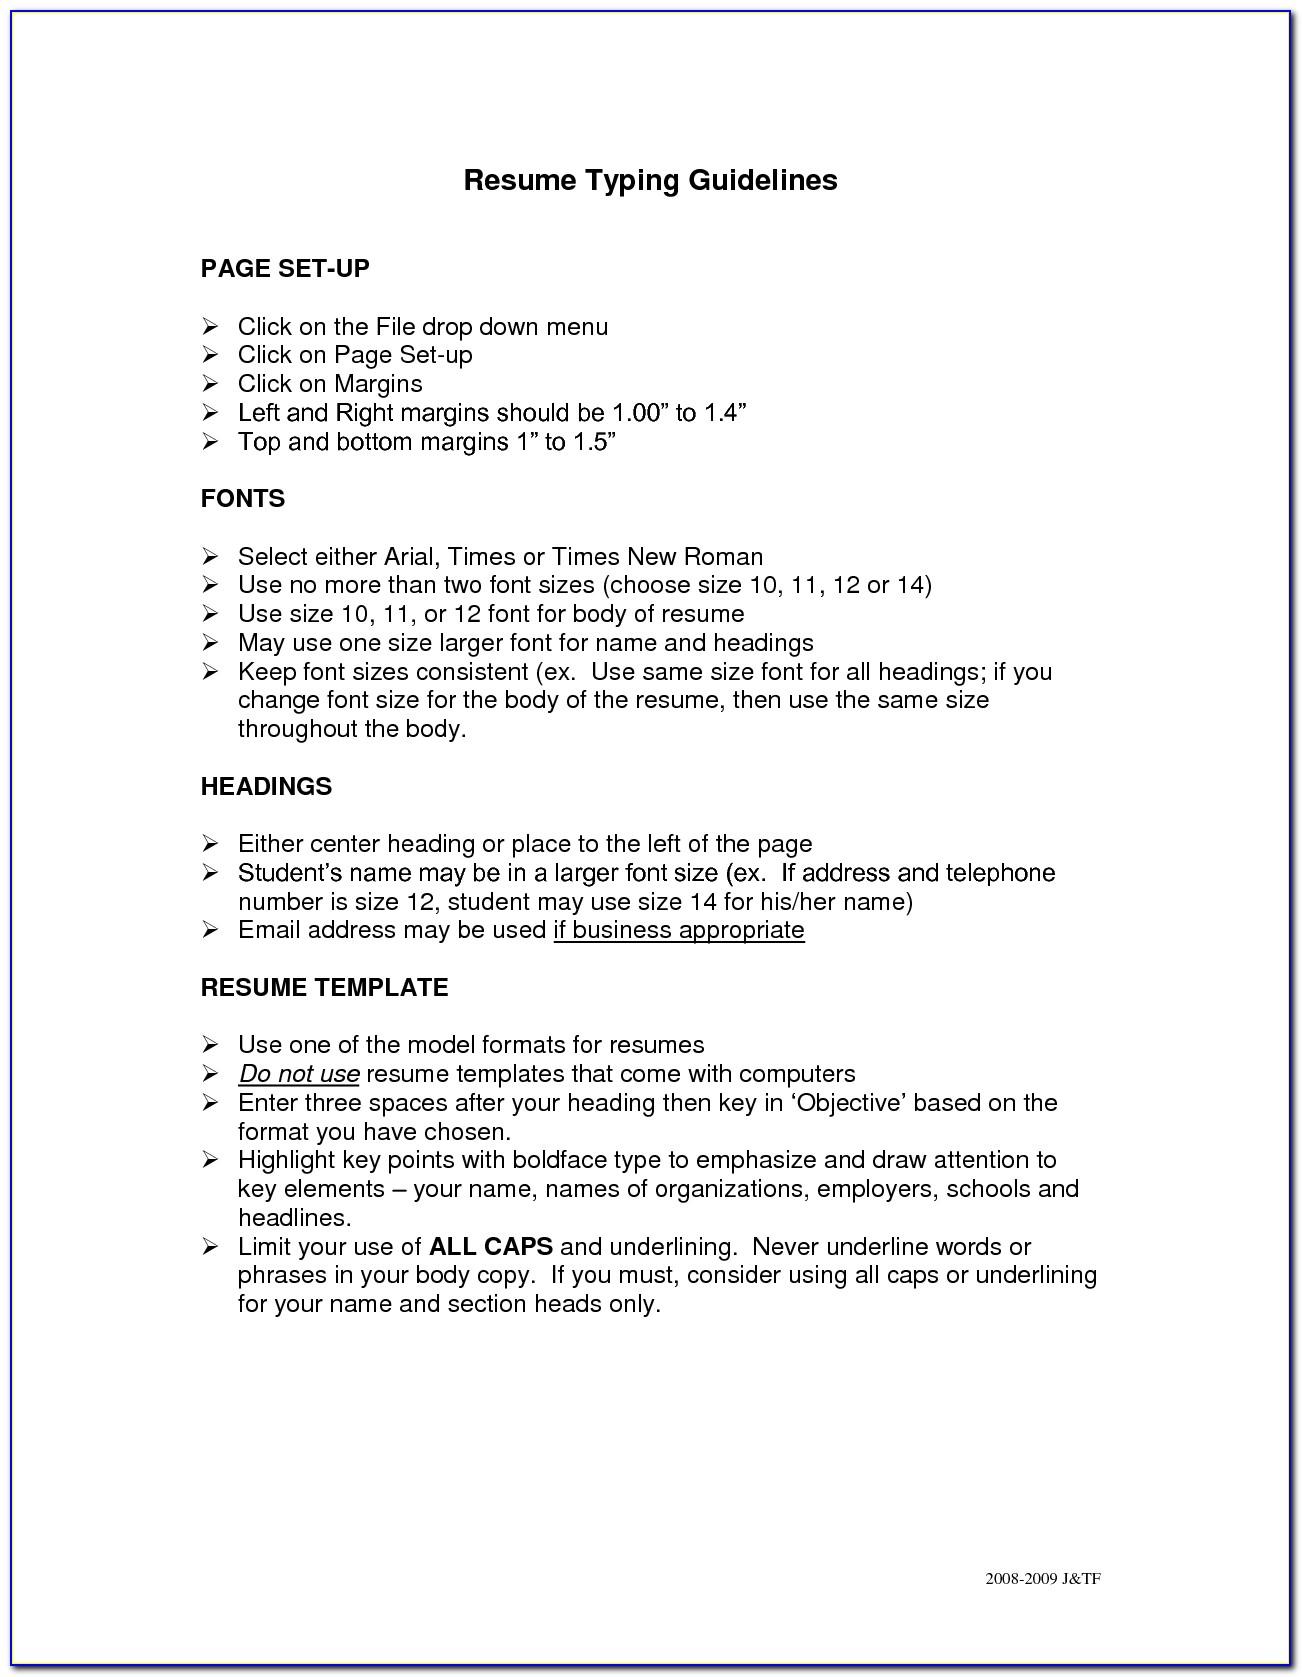 How To Prepare Resume For Job Fair